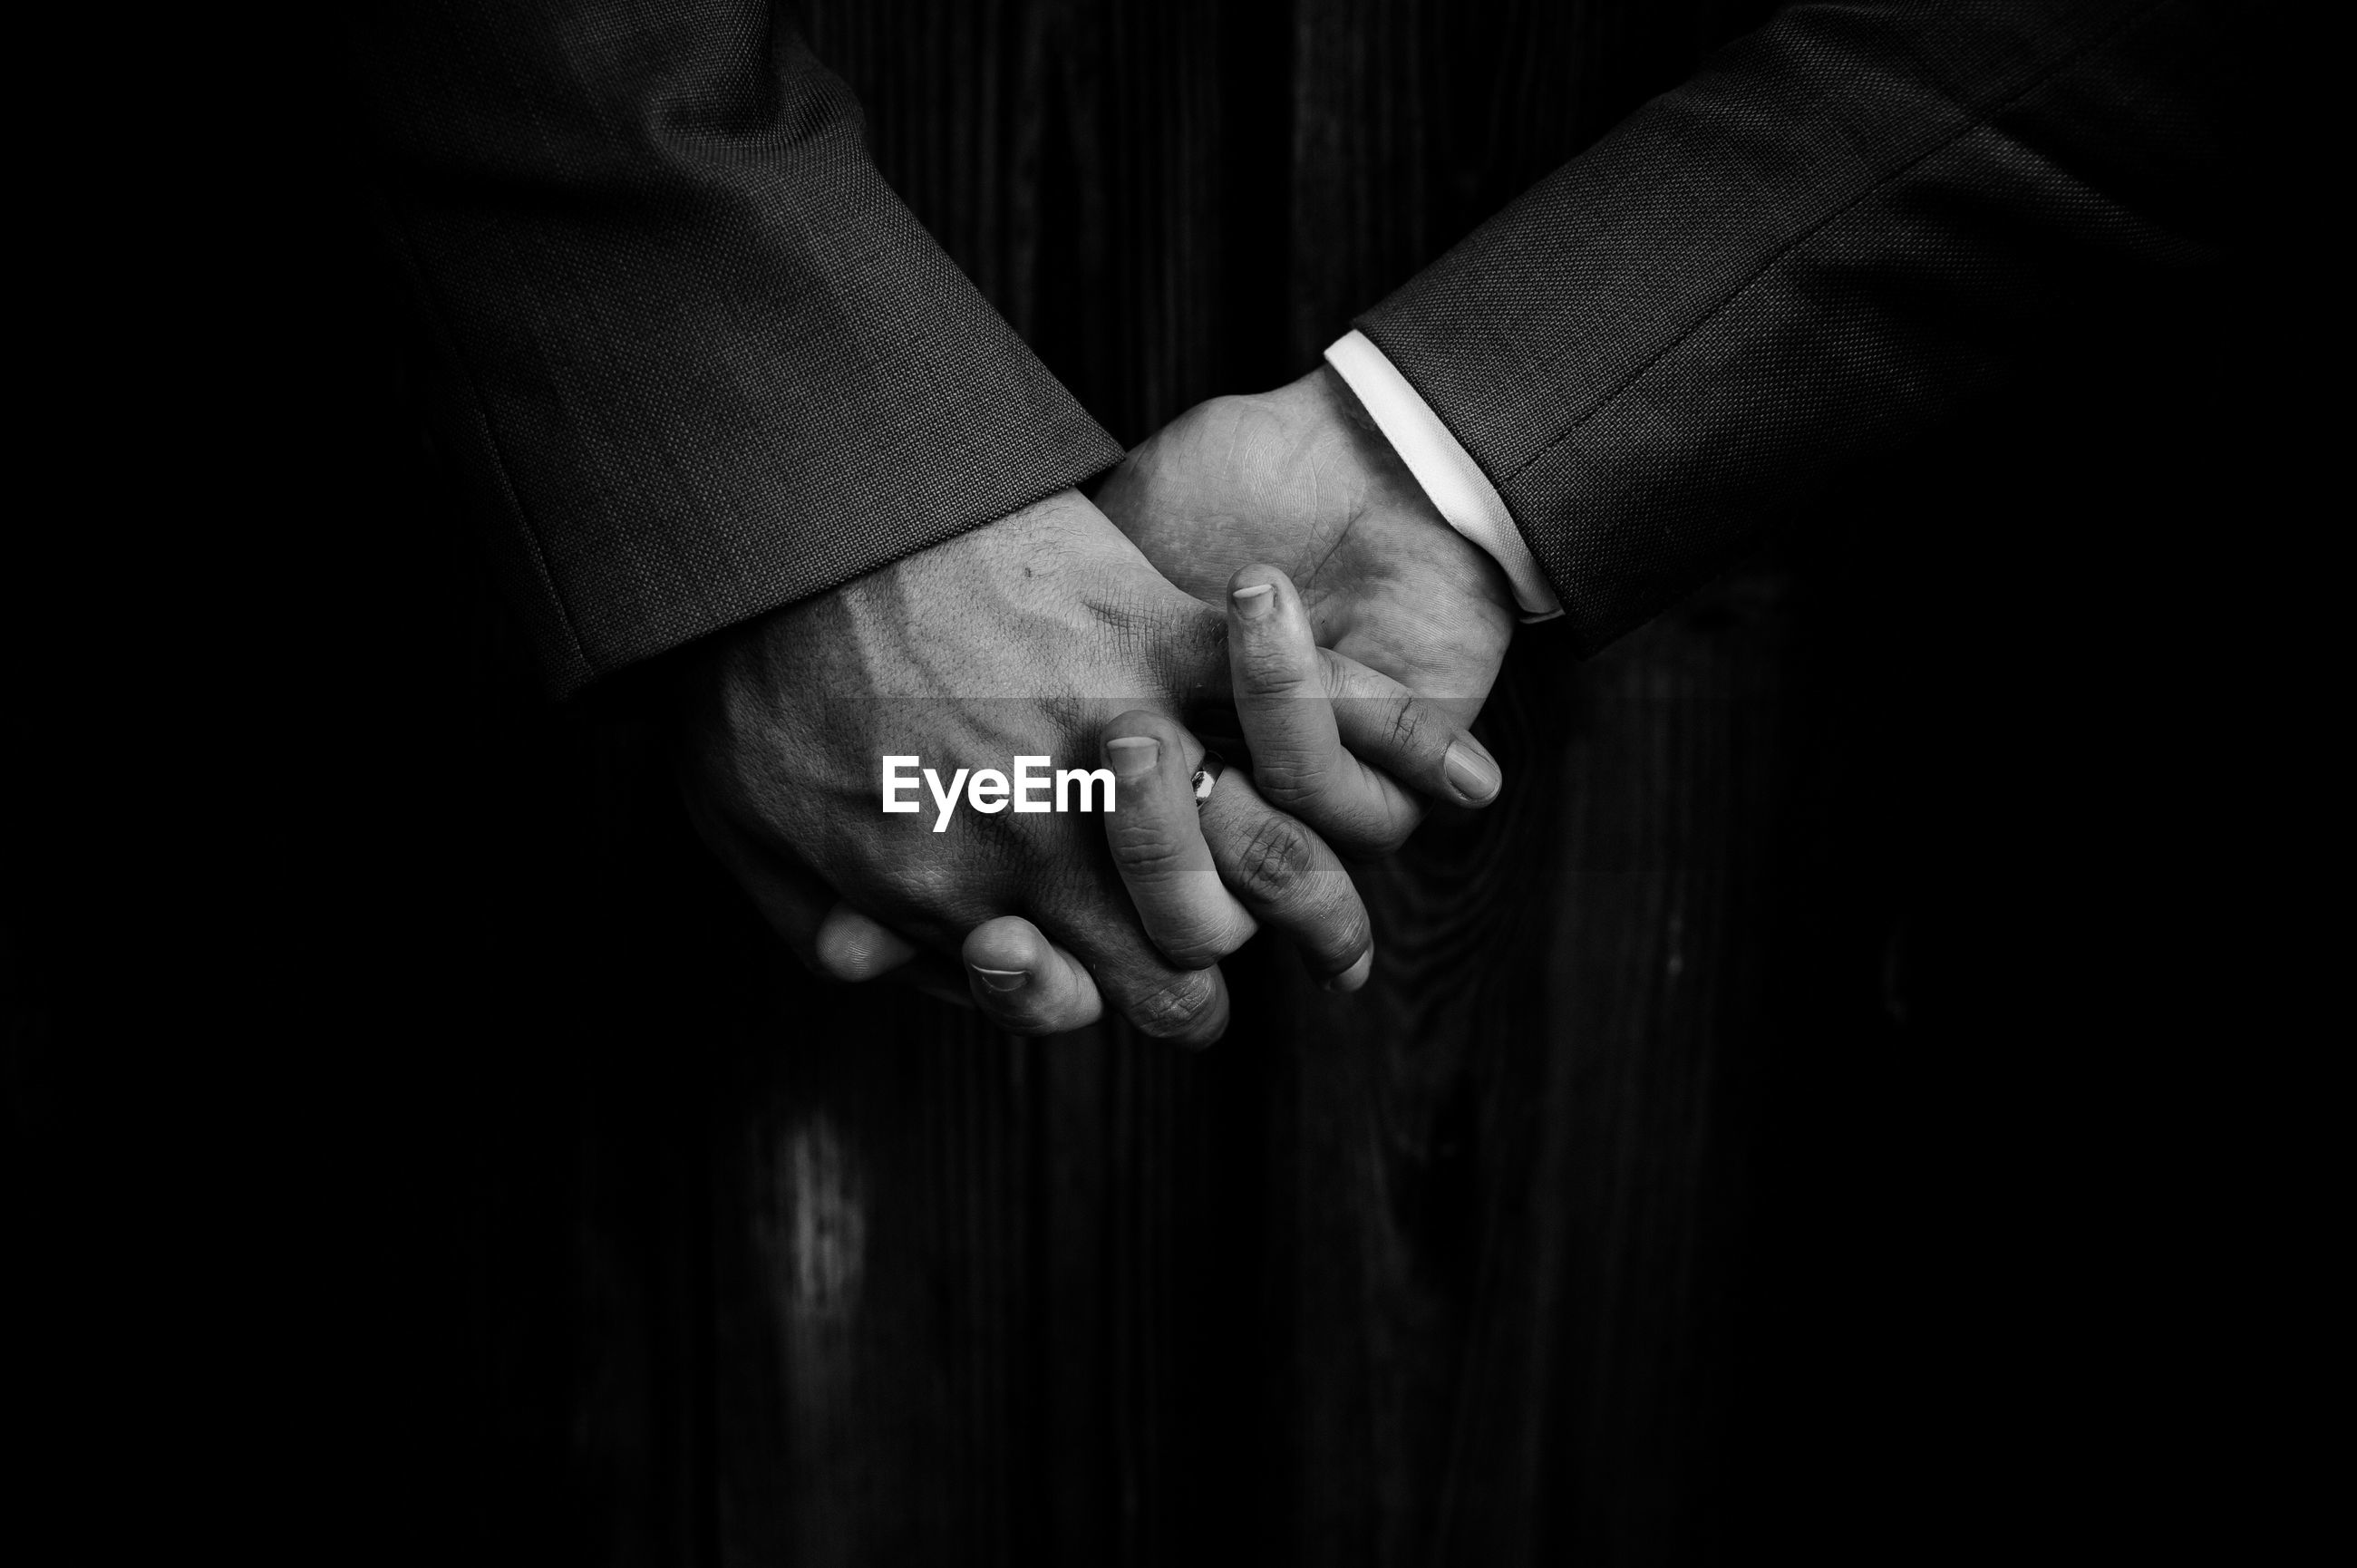 Close-up of gay men holding hands in dark